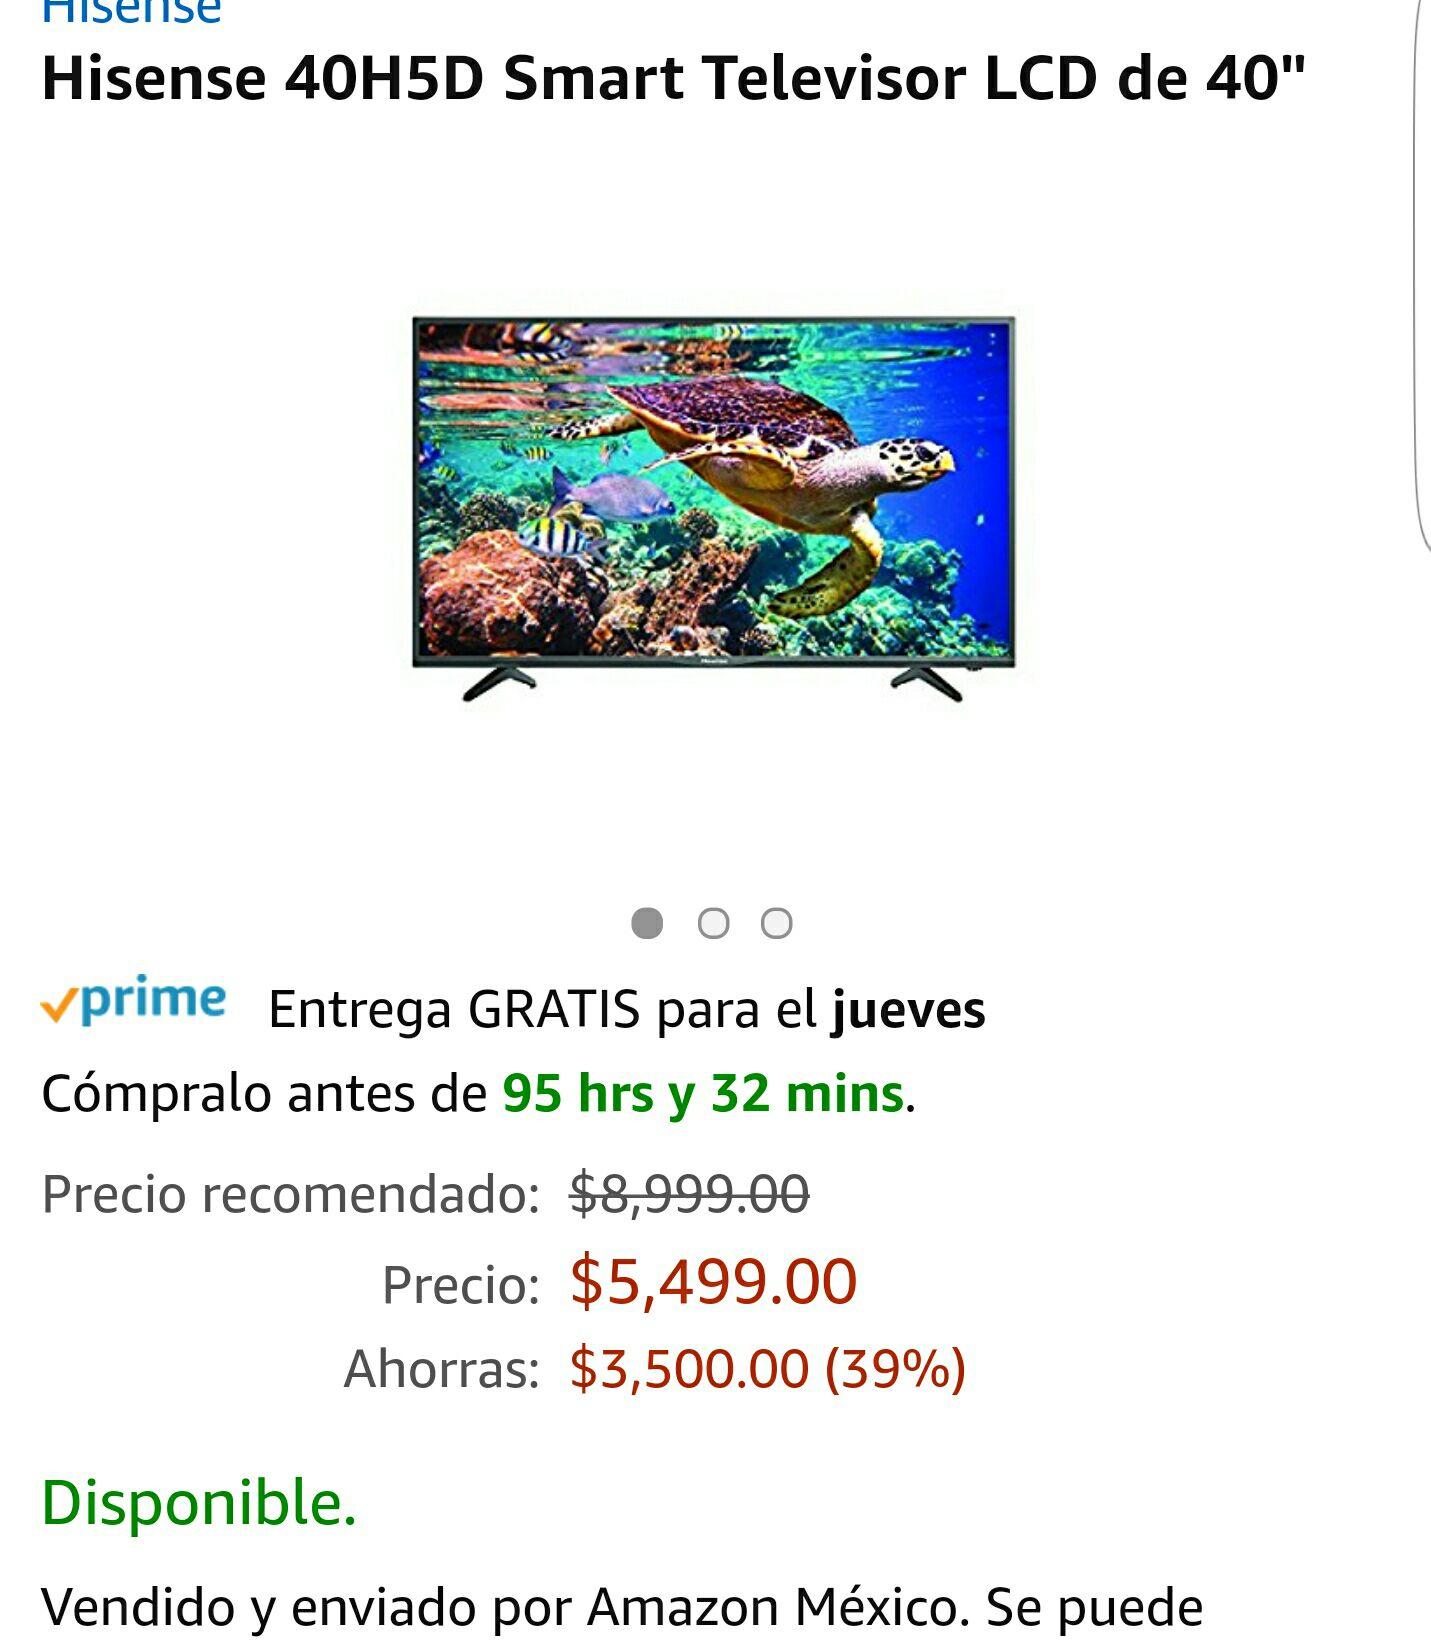 "Ofertas Buen Fin 2017 Amazon: Hisense de 40"" smart FHD 40H5D"